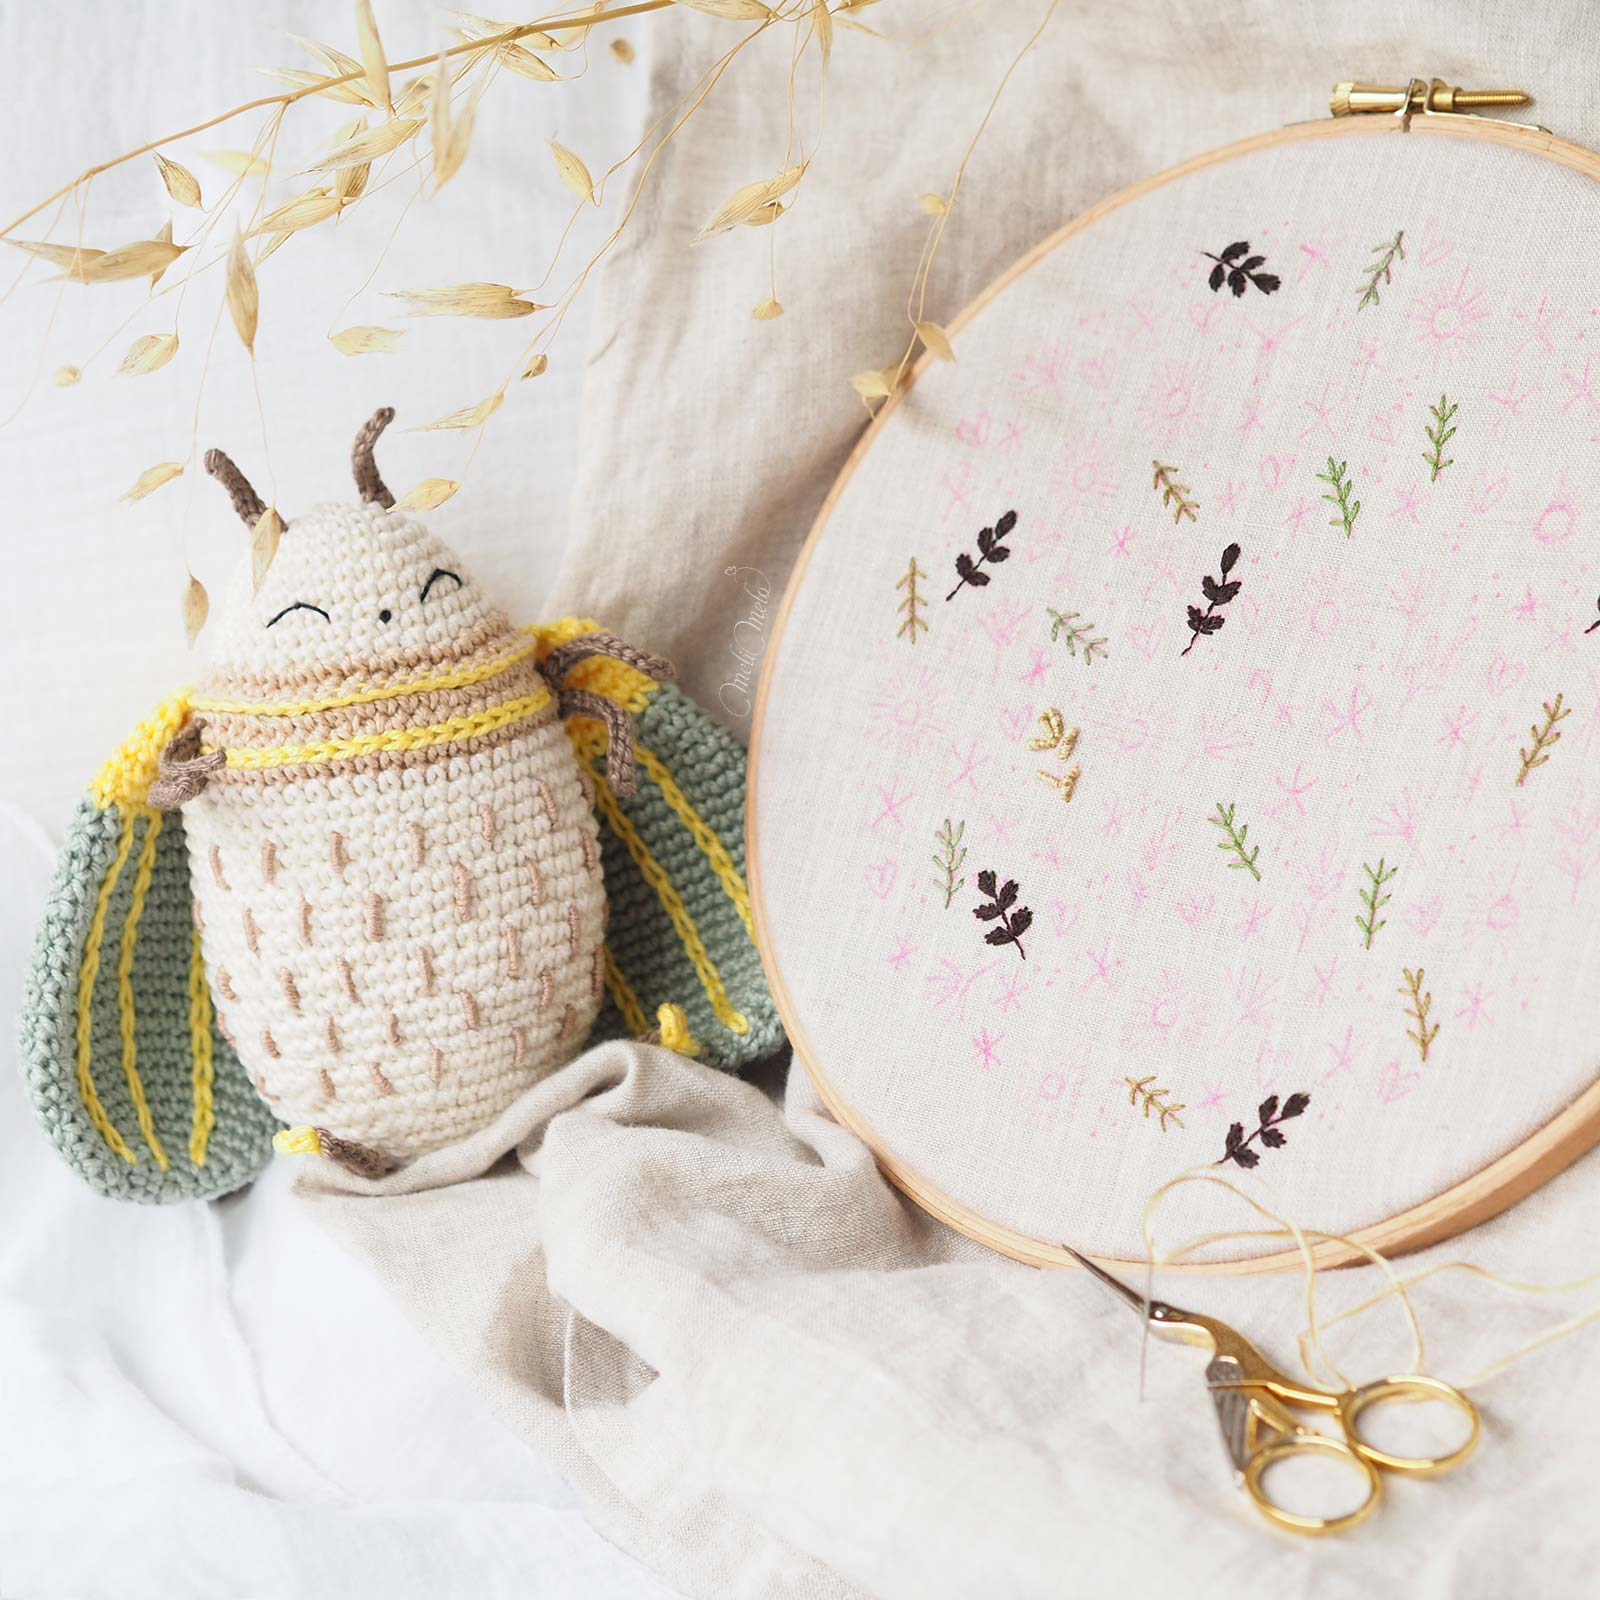 hubertus-scarabee-crochet-amigurumi-eleonoreandmaurice-laboutiquedemelimelo